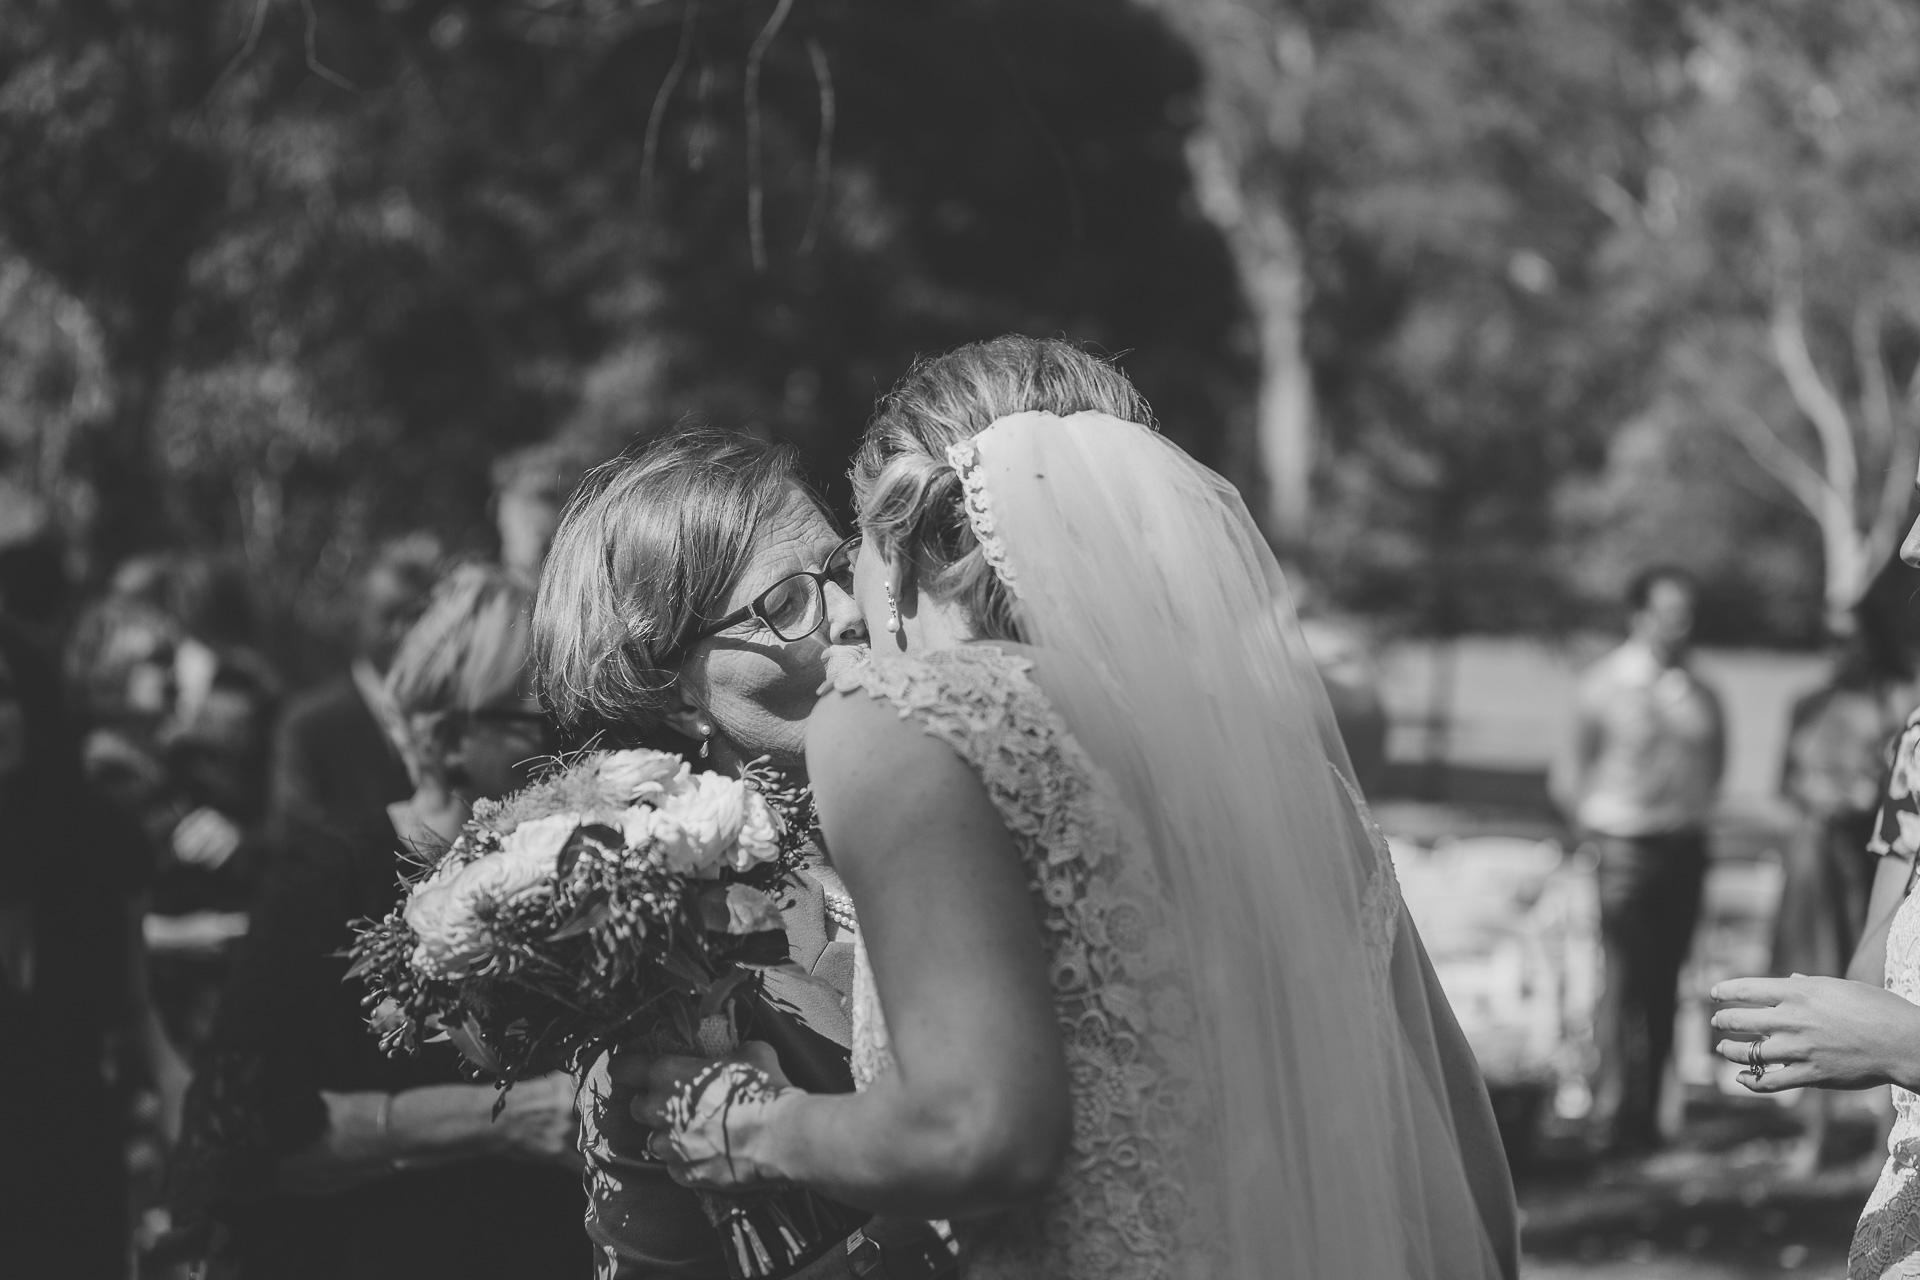 20161112 - Heath_Ruth_Wombat_Hollow_Wedding | 243.jpg